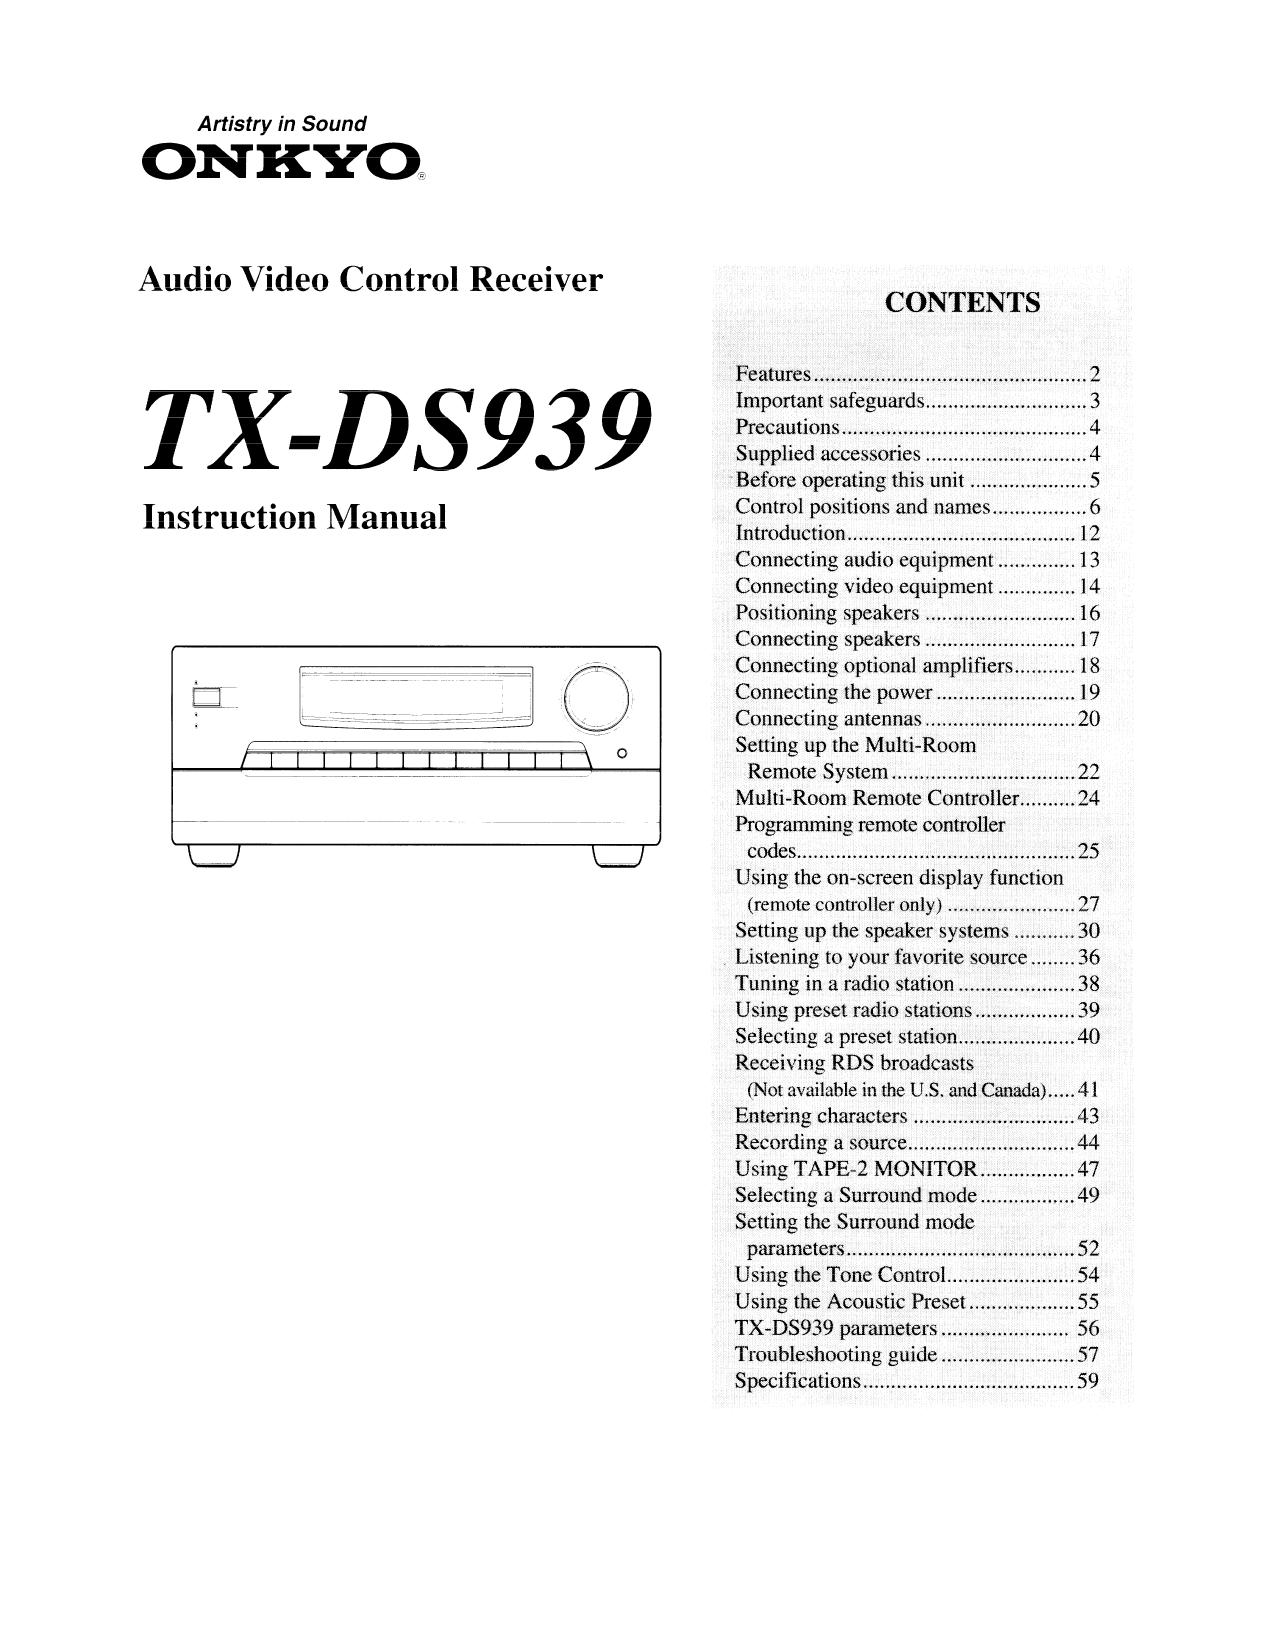 download free pdf for onkyo tx ds939 receiver manual rh umlib com onkyo tx-ds939 service manual onkyo tx-ds939 service manual